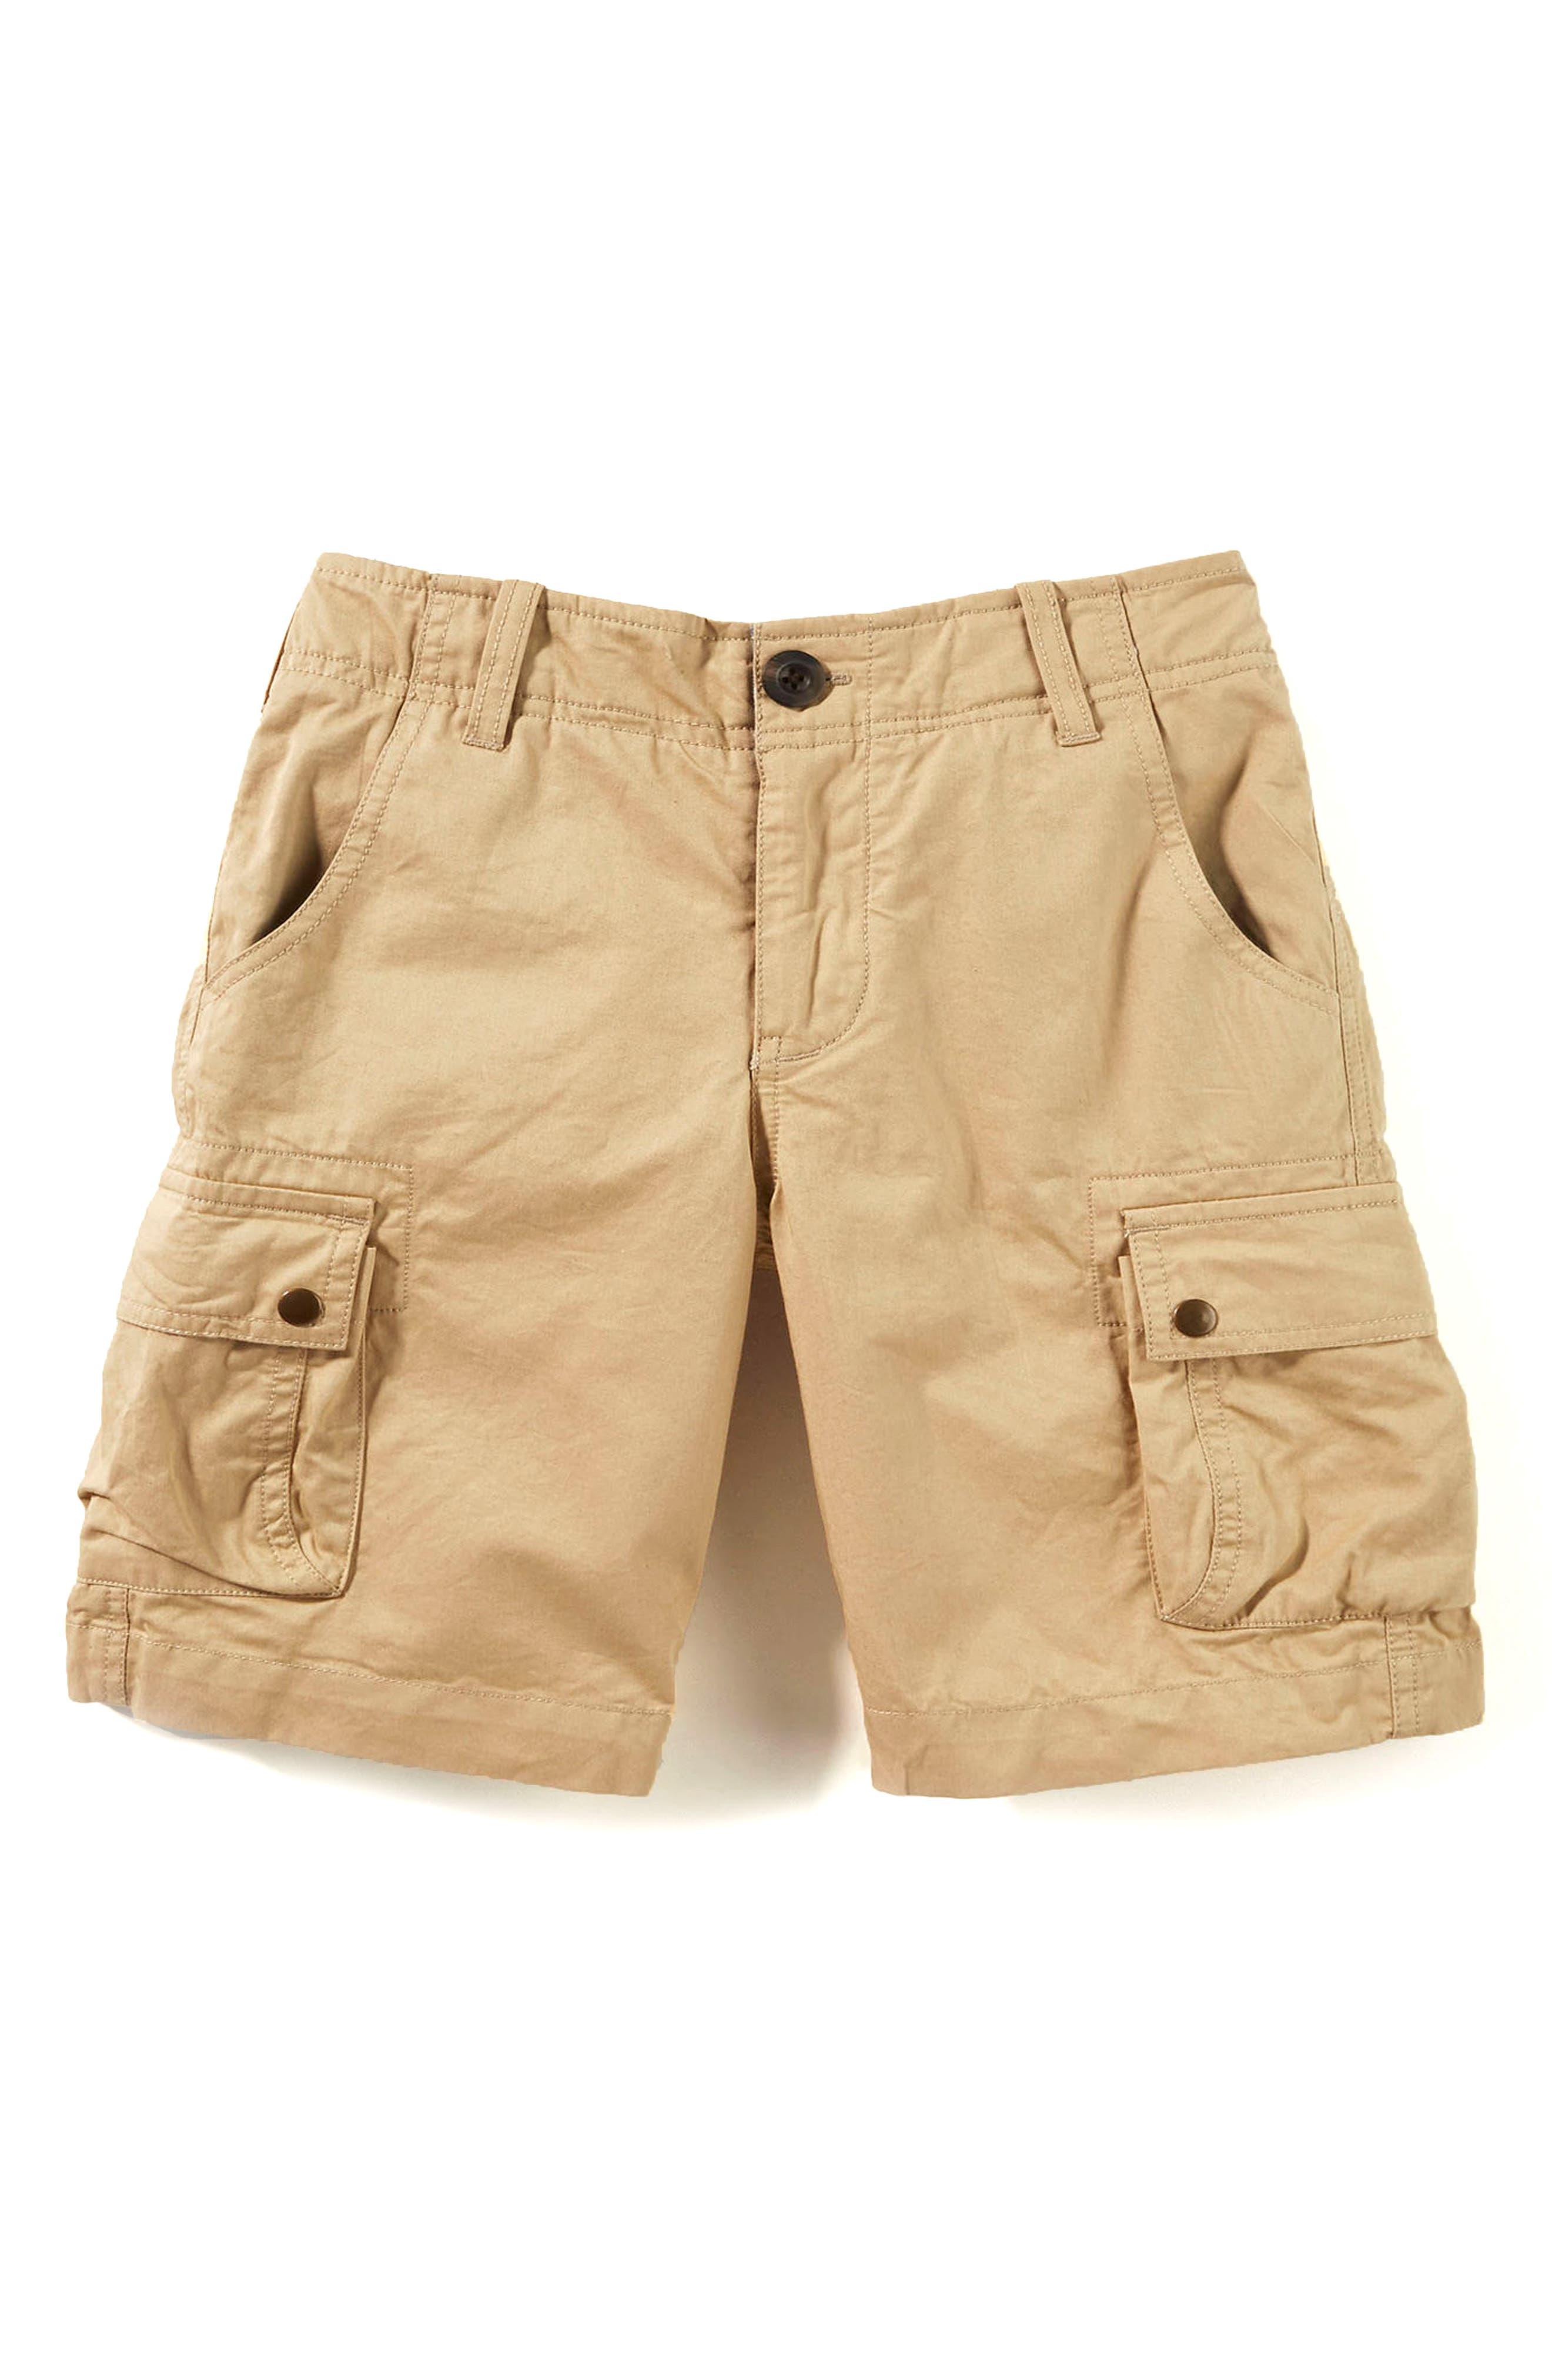 Cargo Shorts,                         Main,                         color, Khaki